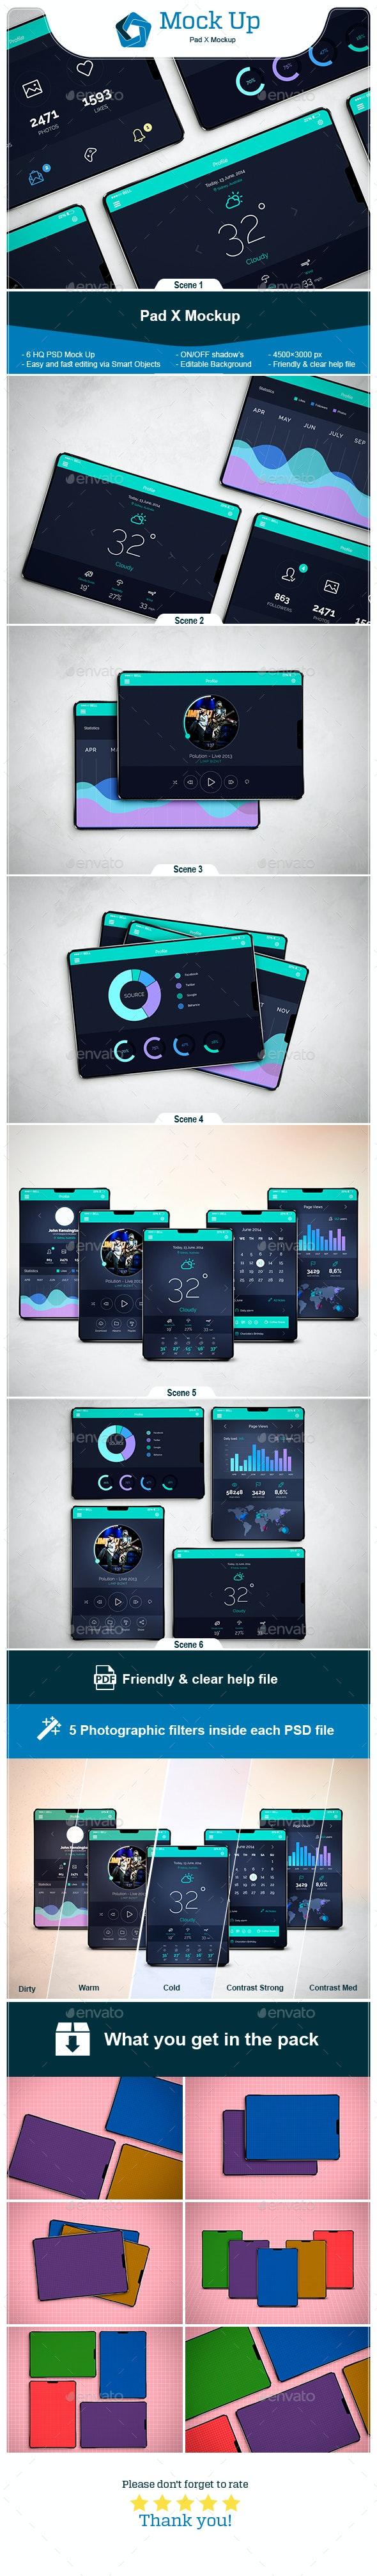 Pad X Mockup - Mobile Displays